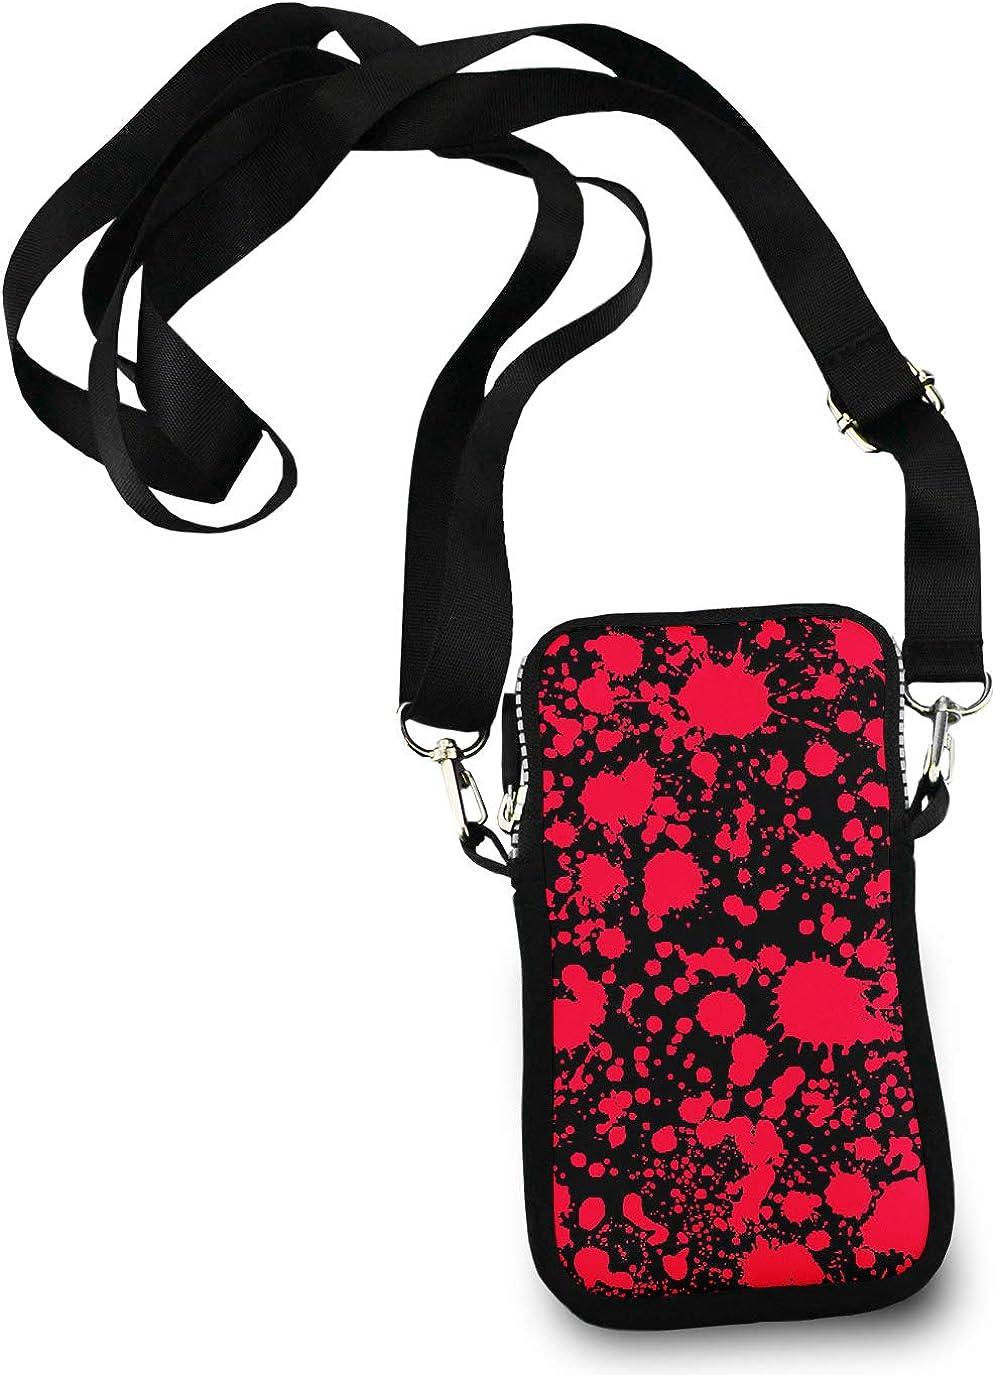 Unisex Small Crossbody Bag Cell Phone Purse Wallet Headphone Bag Classic Horror Blood Splatter Black